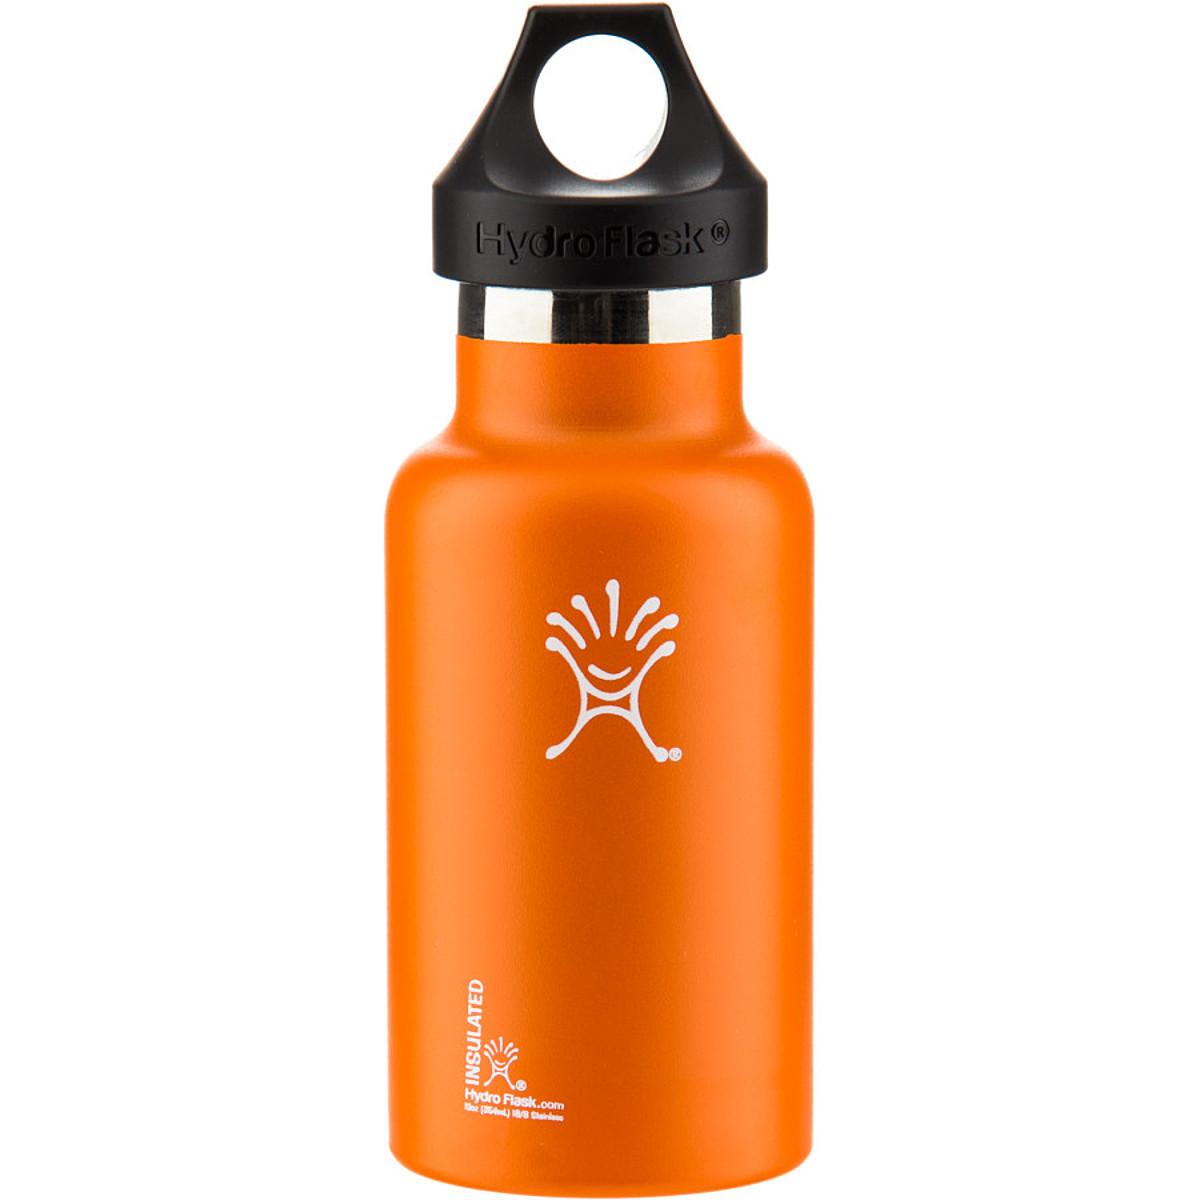 Hydro Flask 12 oz Standard Mouth Bottle